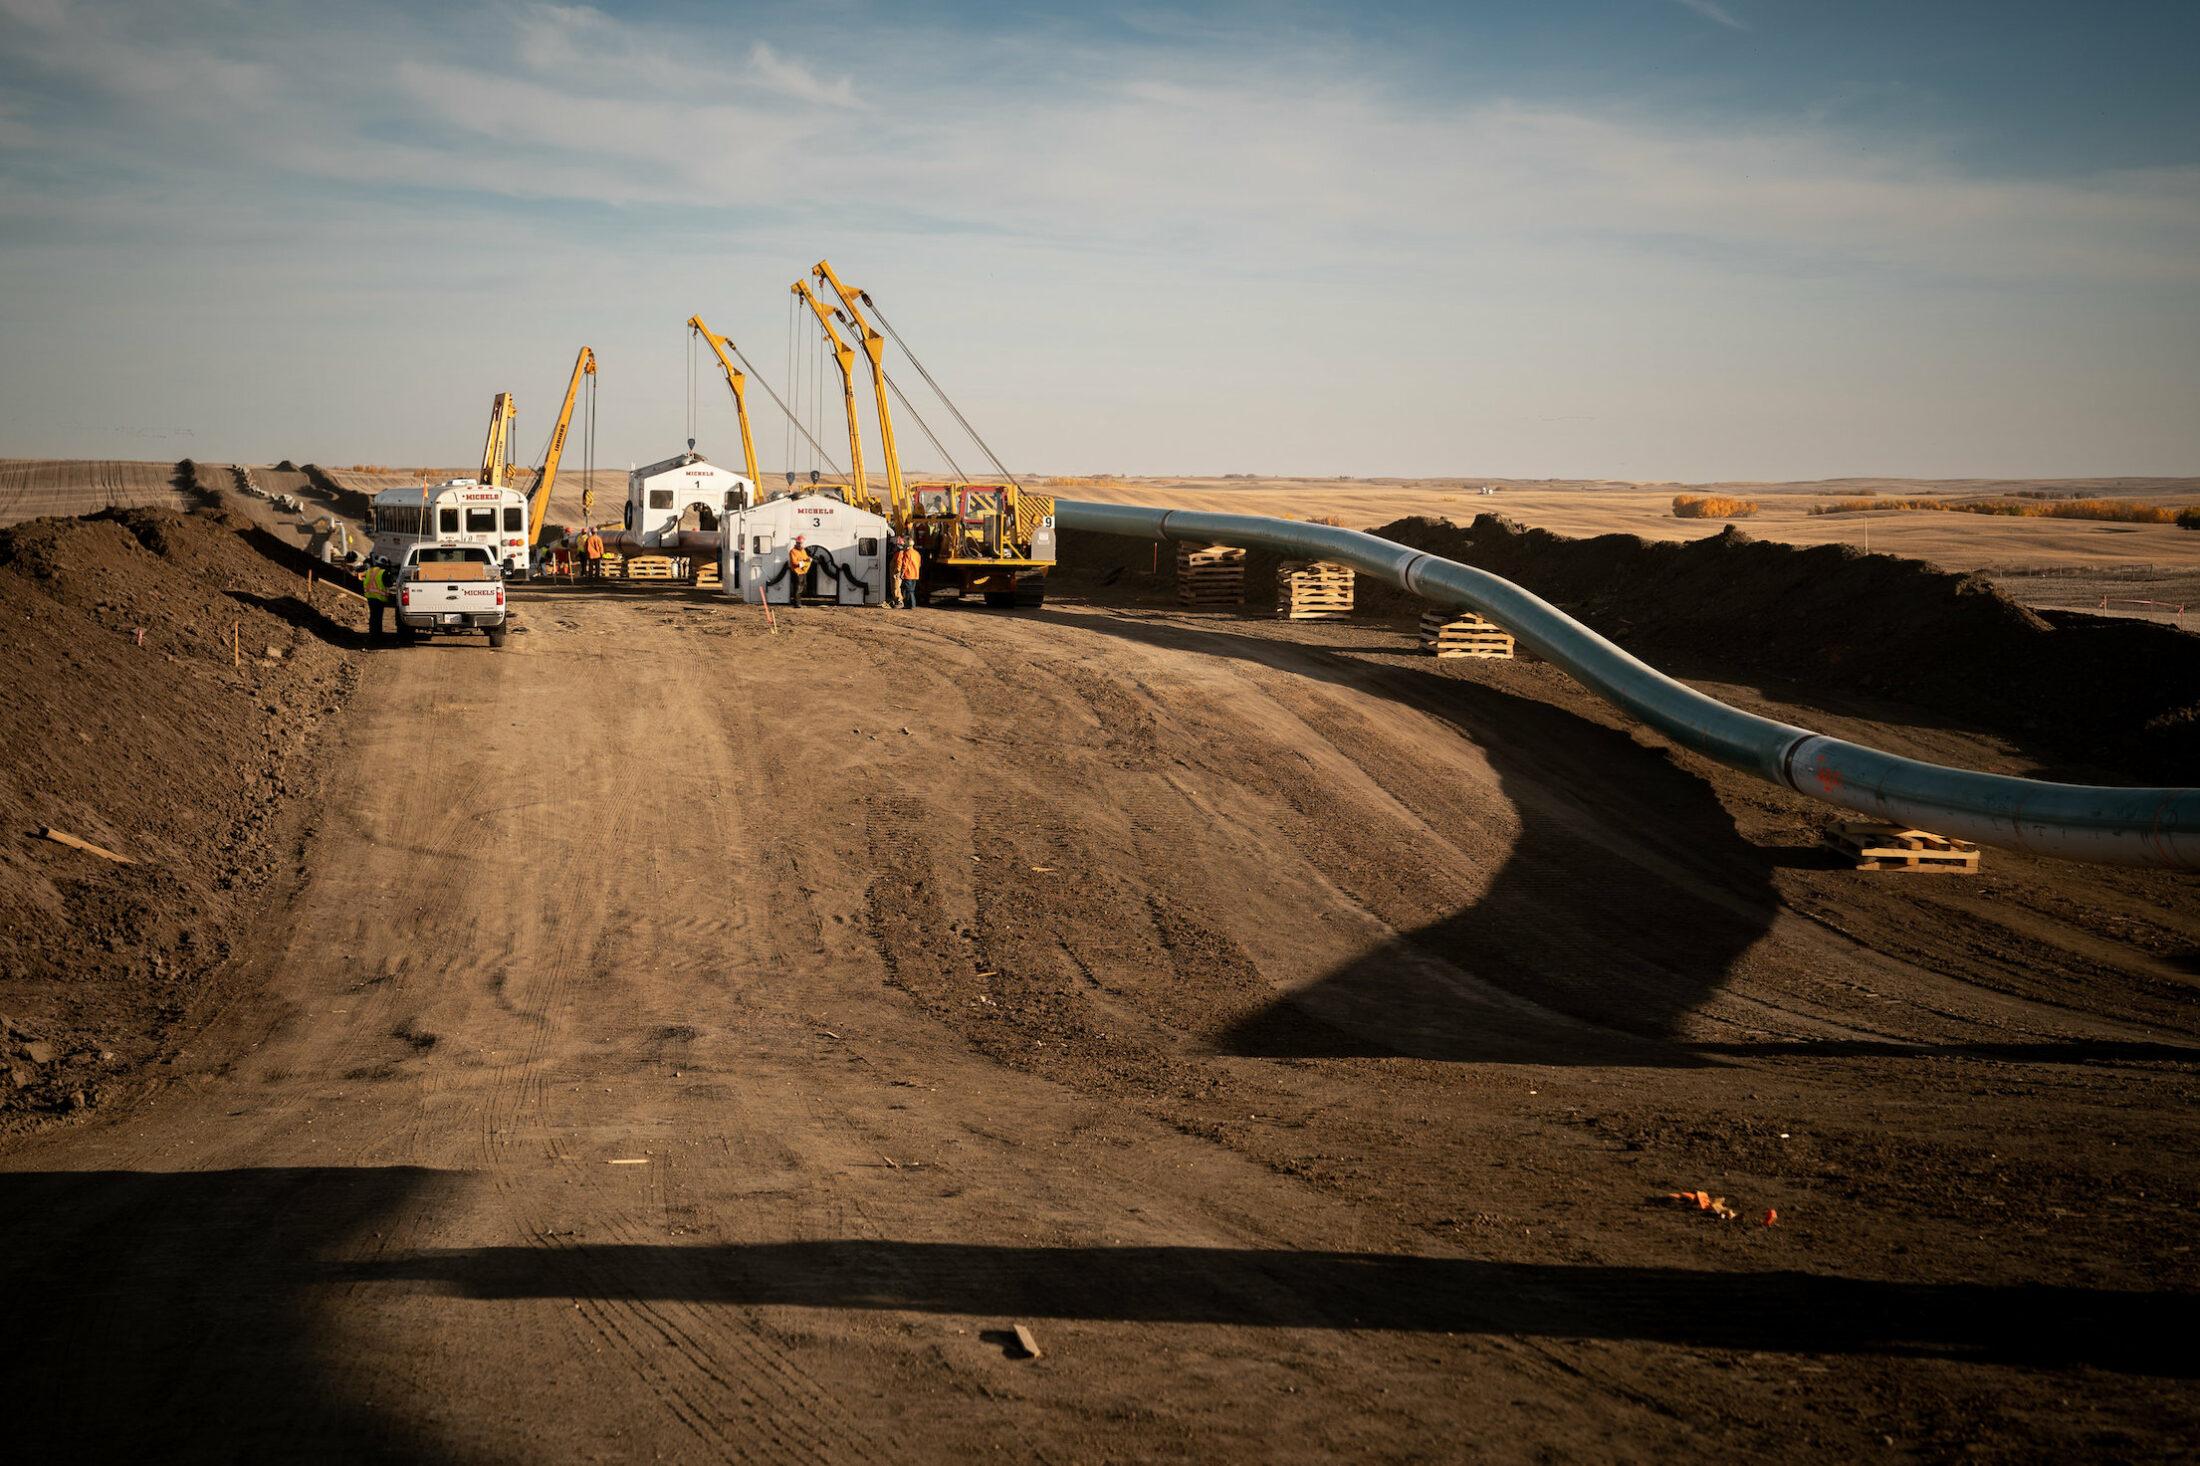 Biden climate change plans affect Keystone XL pipeline construction in Alberta